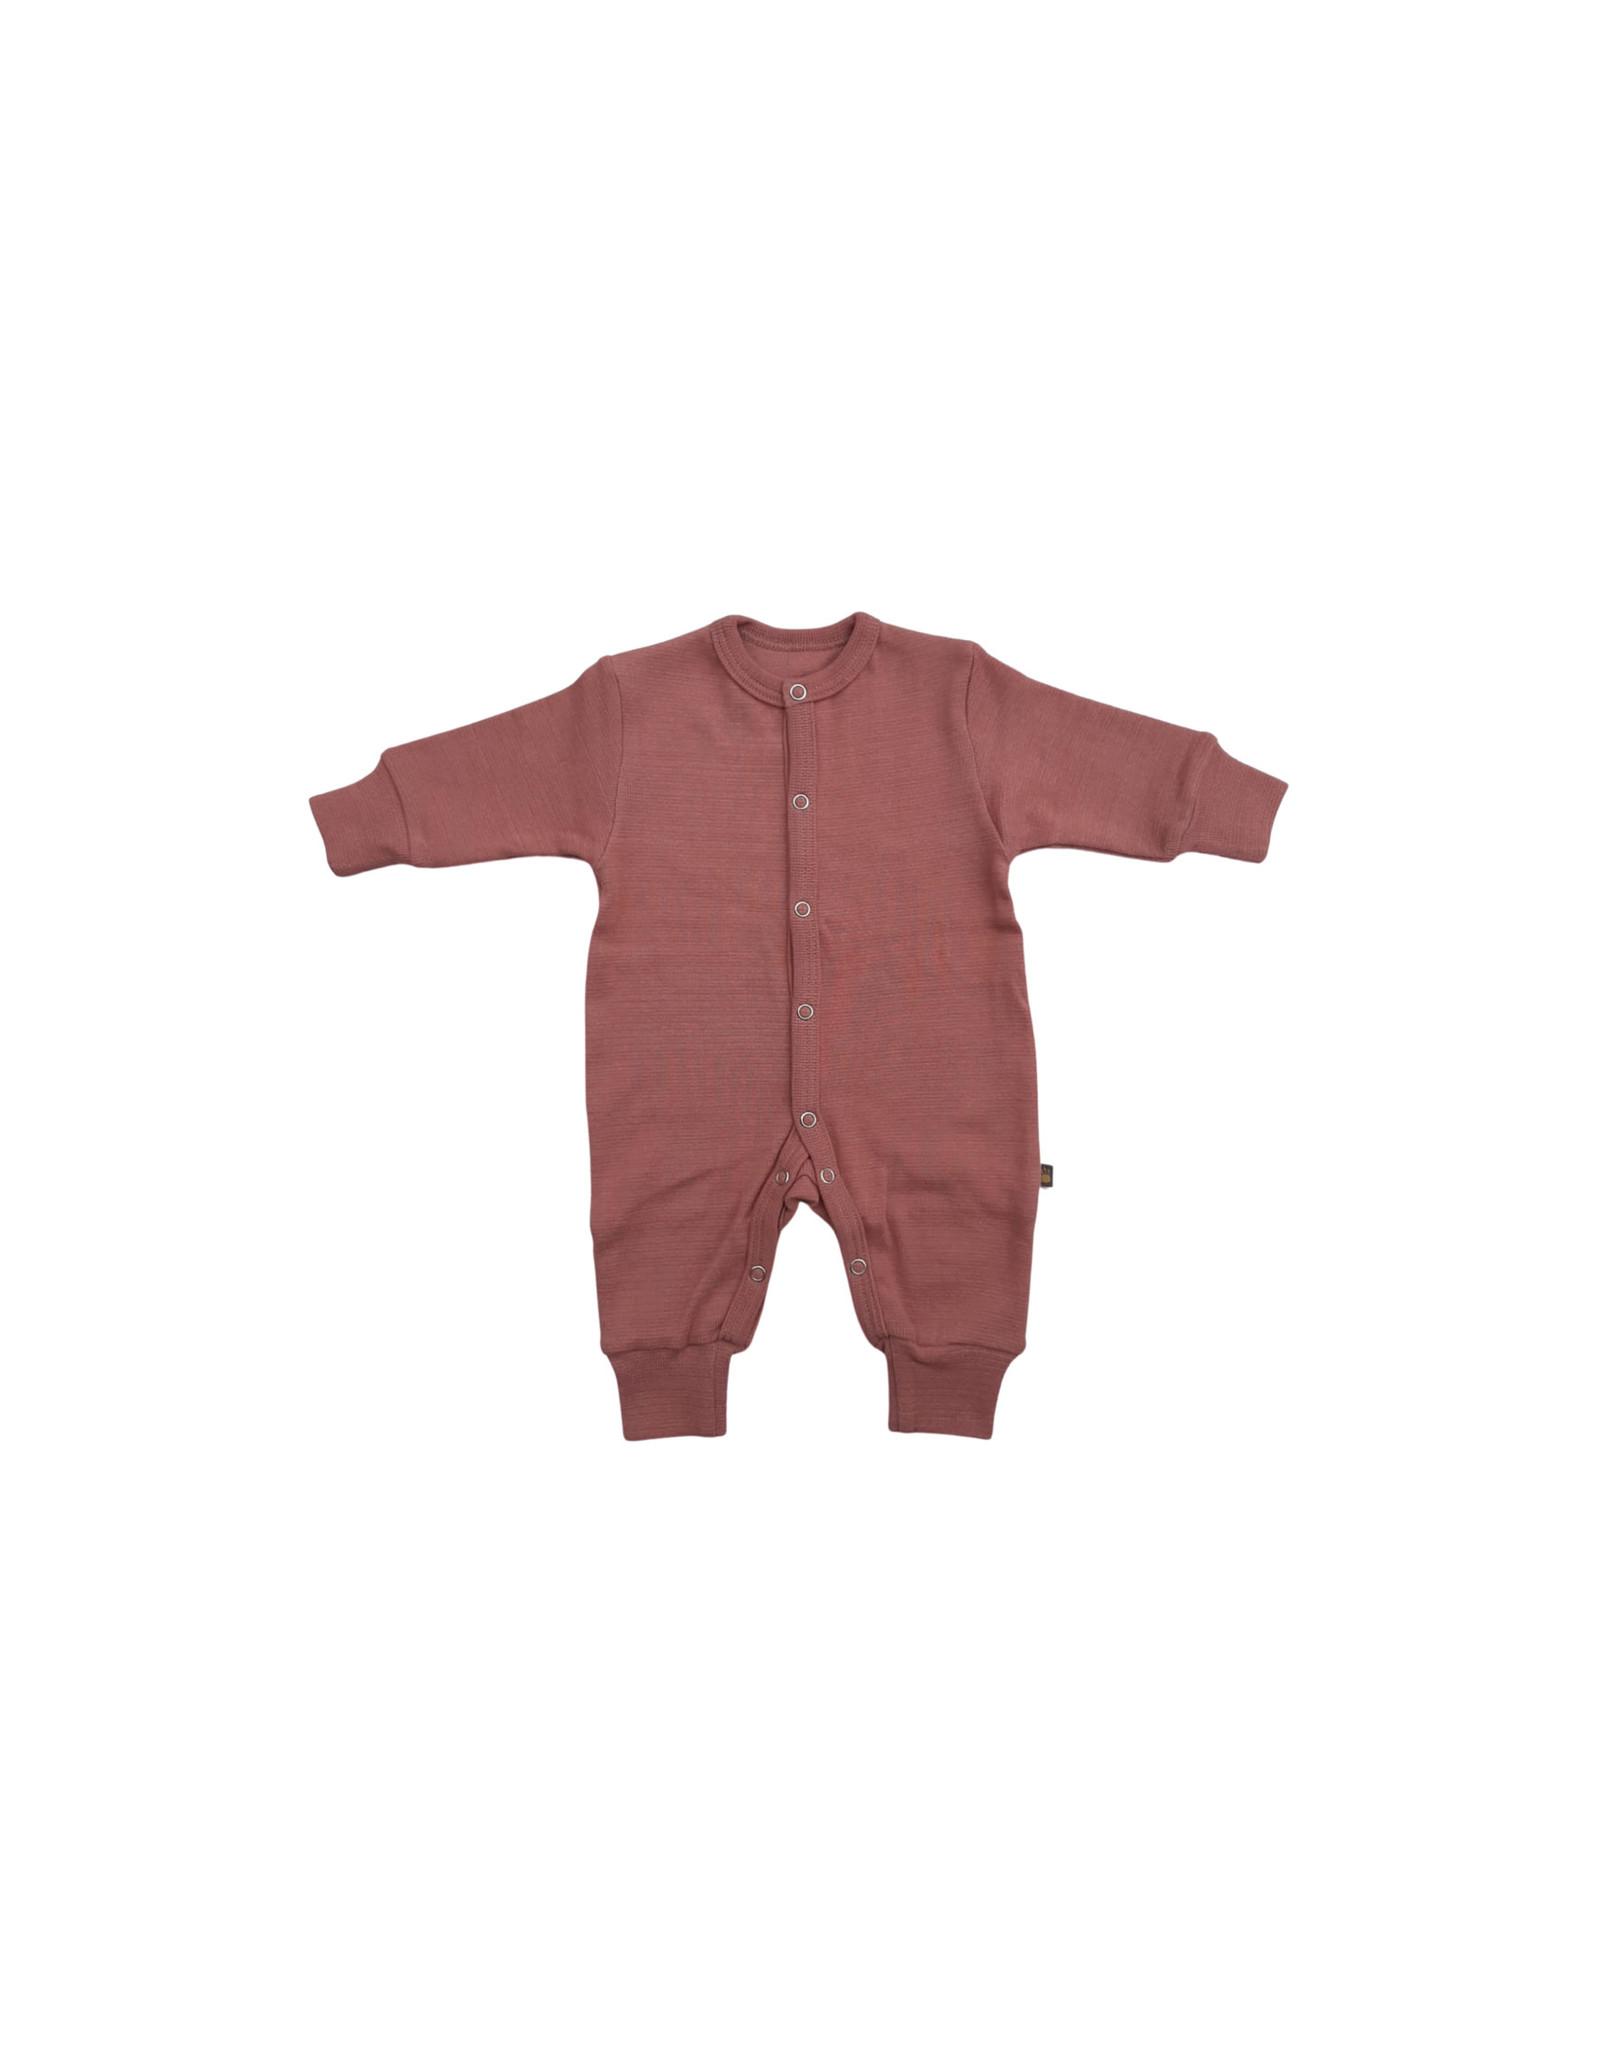 Forgaminnt Forgaminnt Pyjama Zonder Voetjes Ash Rose